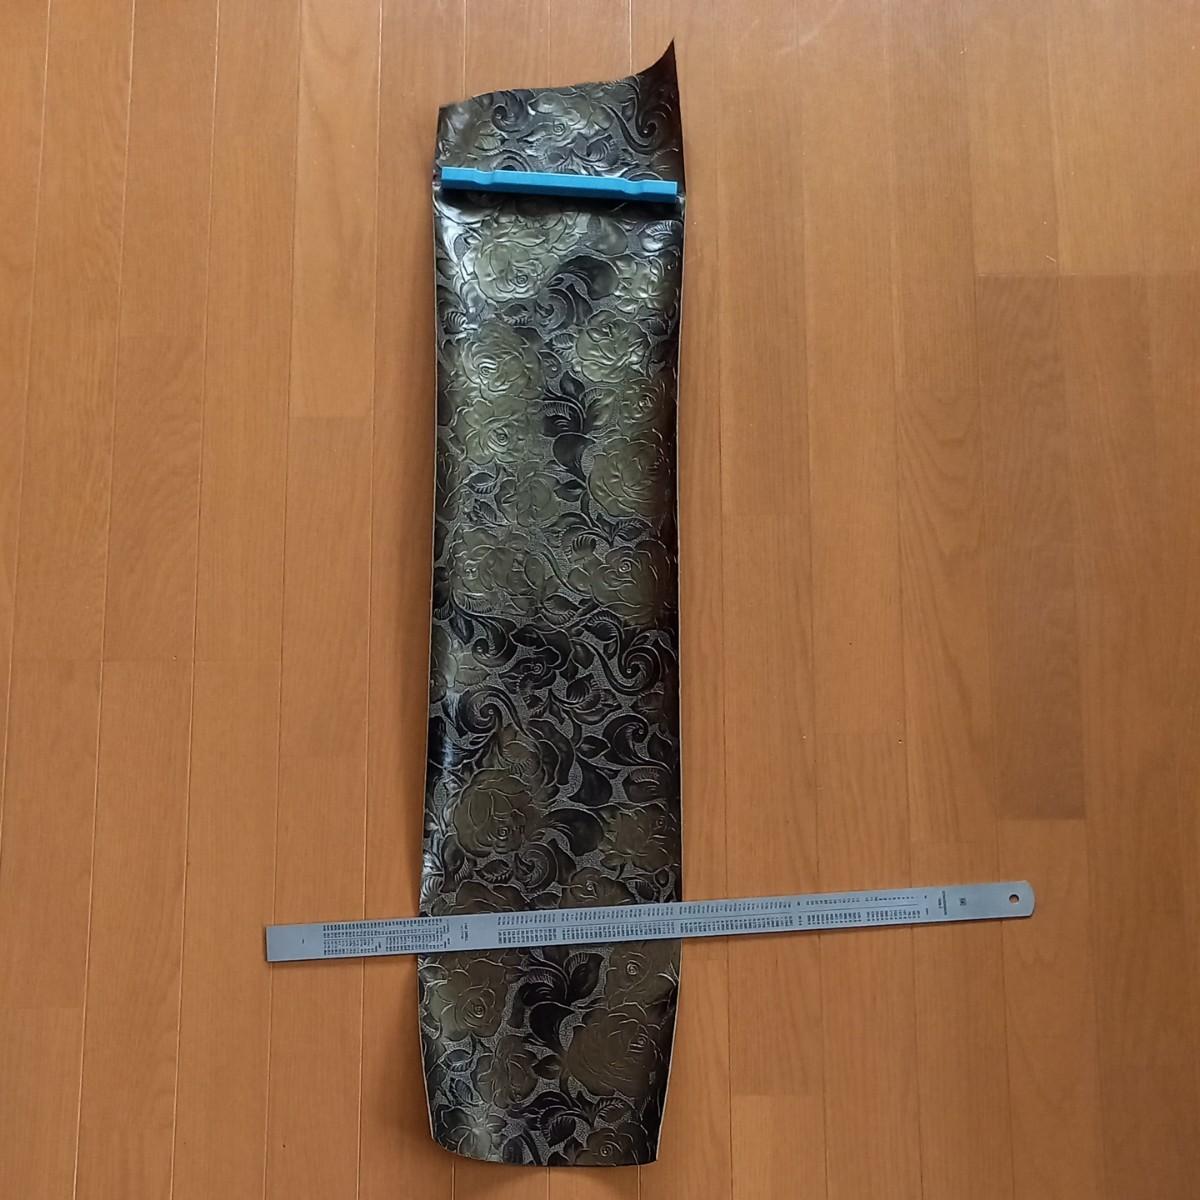 sale革ハギレ 薔薇型押し パールブラックゴールド レザークラフト